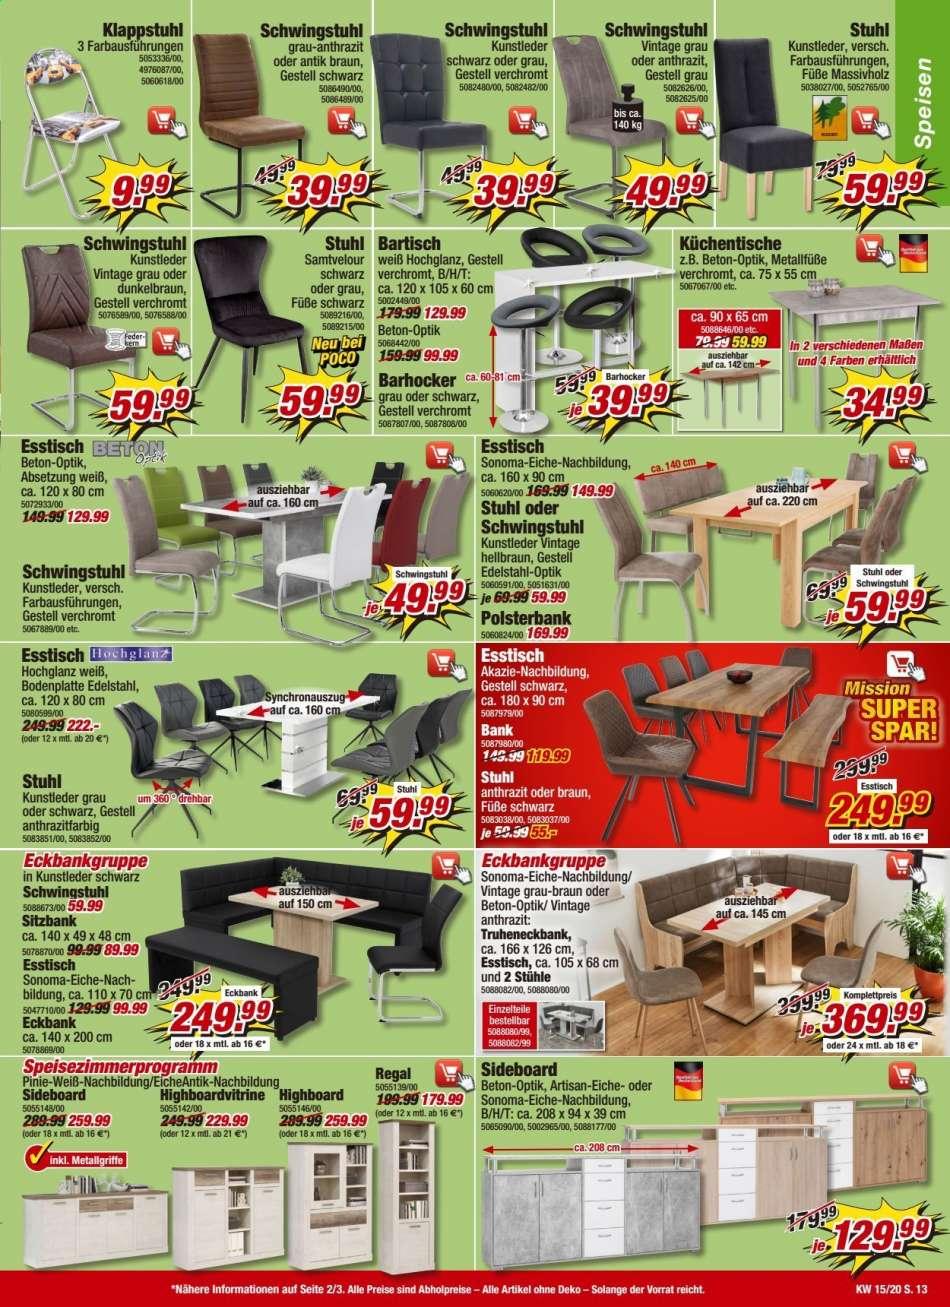 Full Size of Poco Prospekt 252020 652020 Rabatt Kompass Schlafzimmer Komplett Betten Big Sofa Bett 140x200 Küche Wohnzimmer Eckbankgruppe Poco